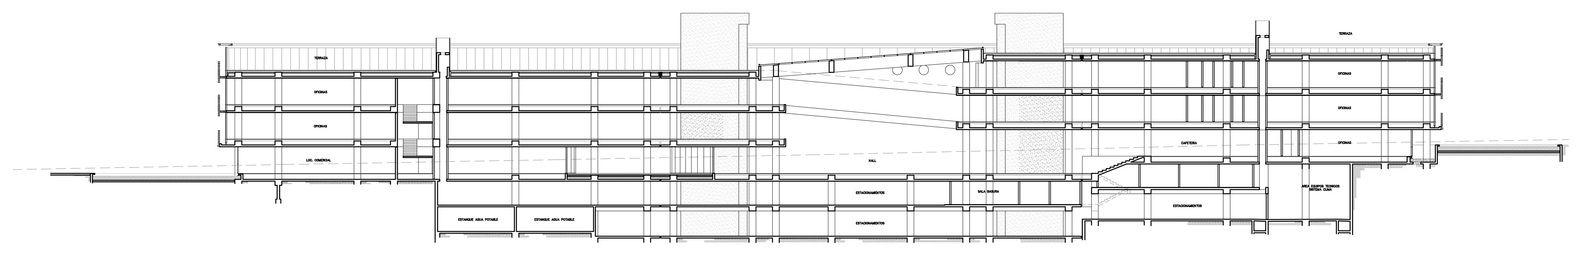 Galeria de Edifício Transoceánica / +arquitectos - 48